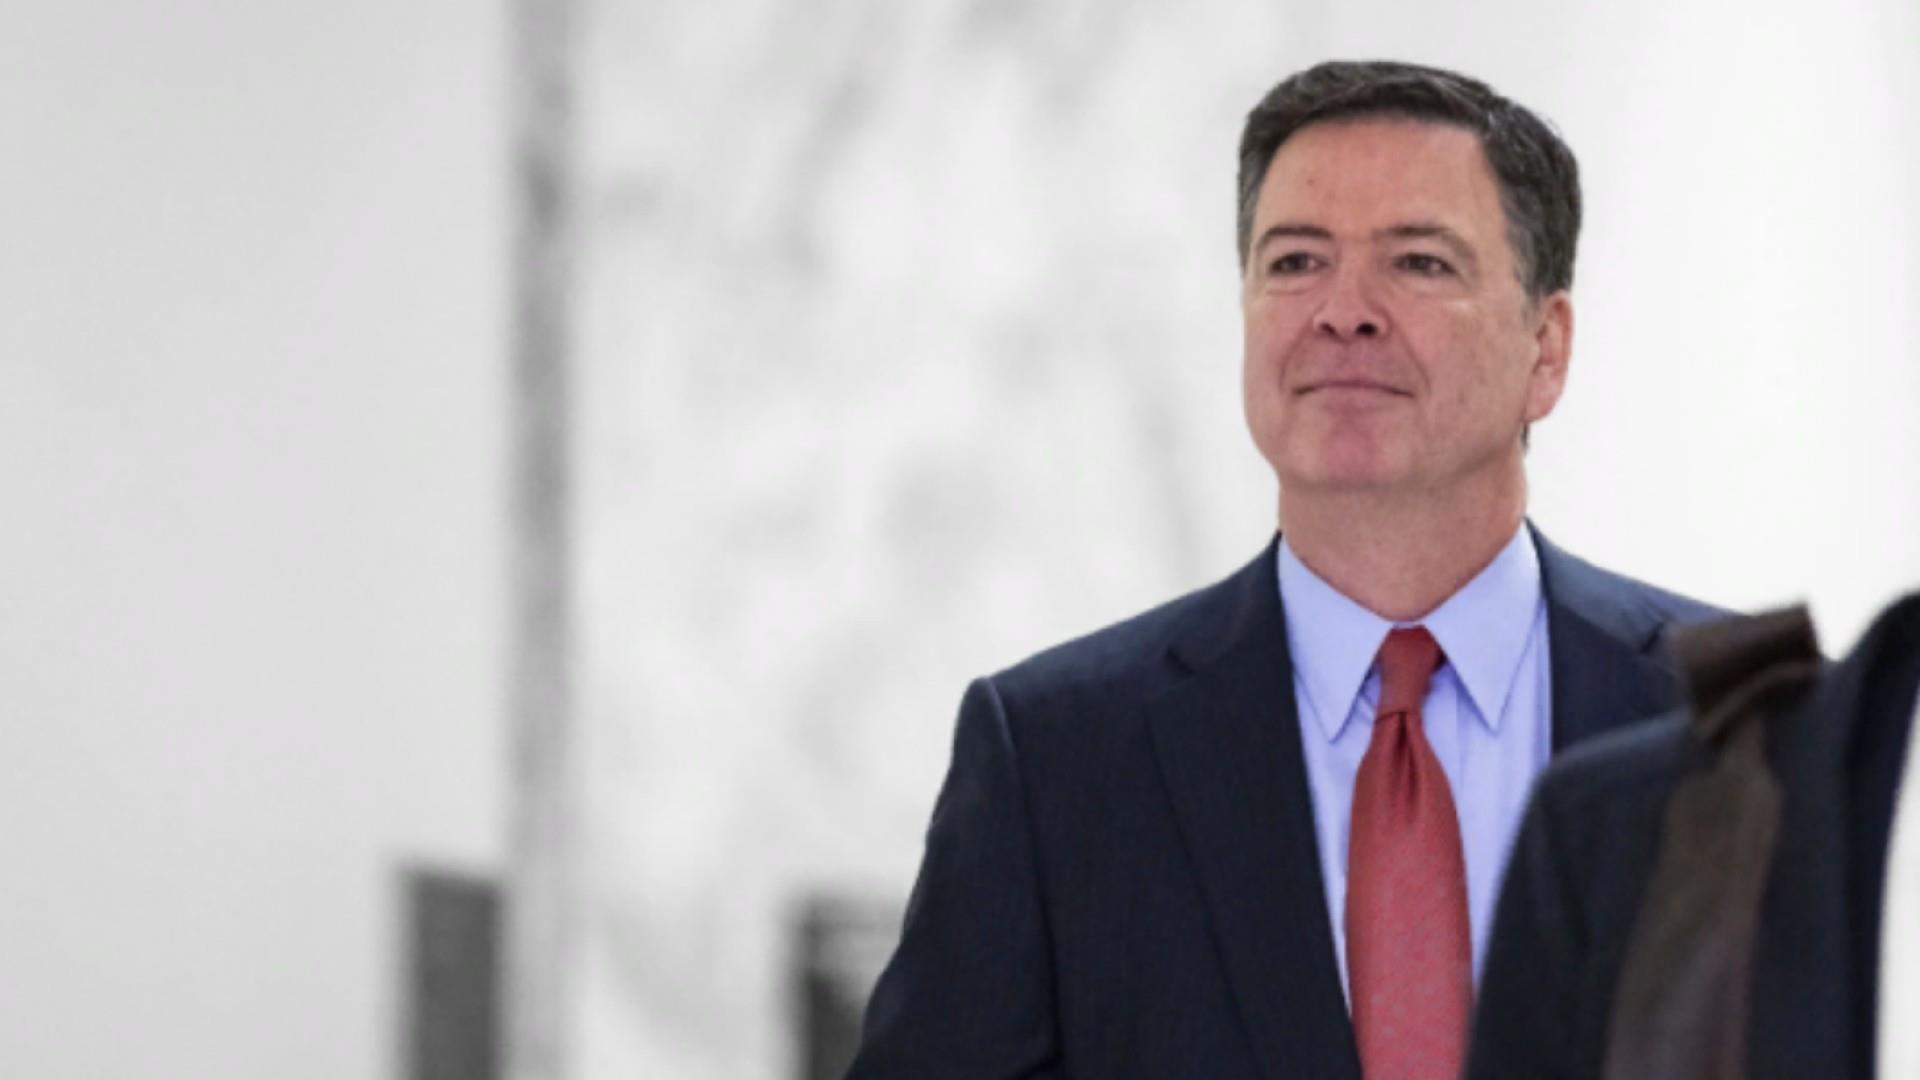 After Trump's FBI attacks, Comey defends bureau in NBC News interview